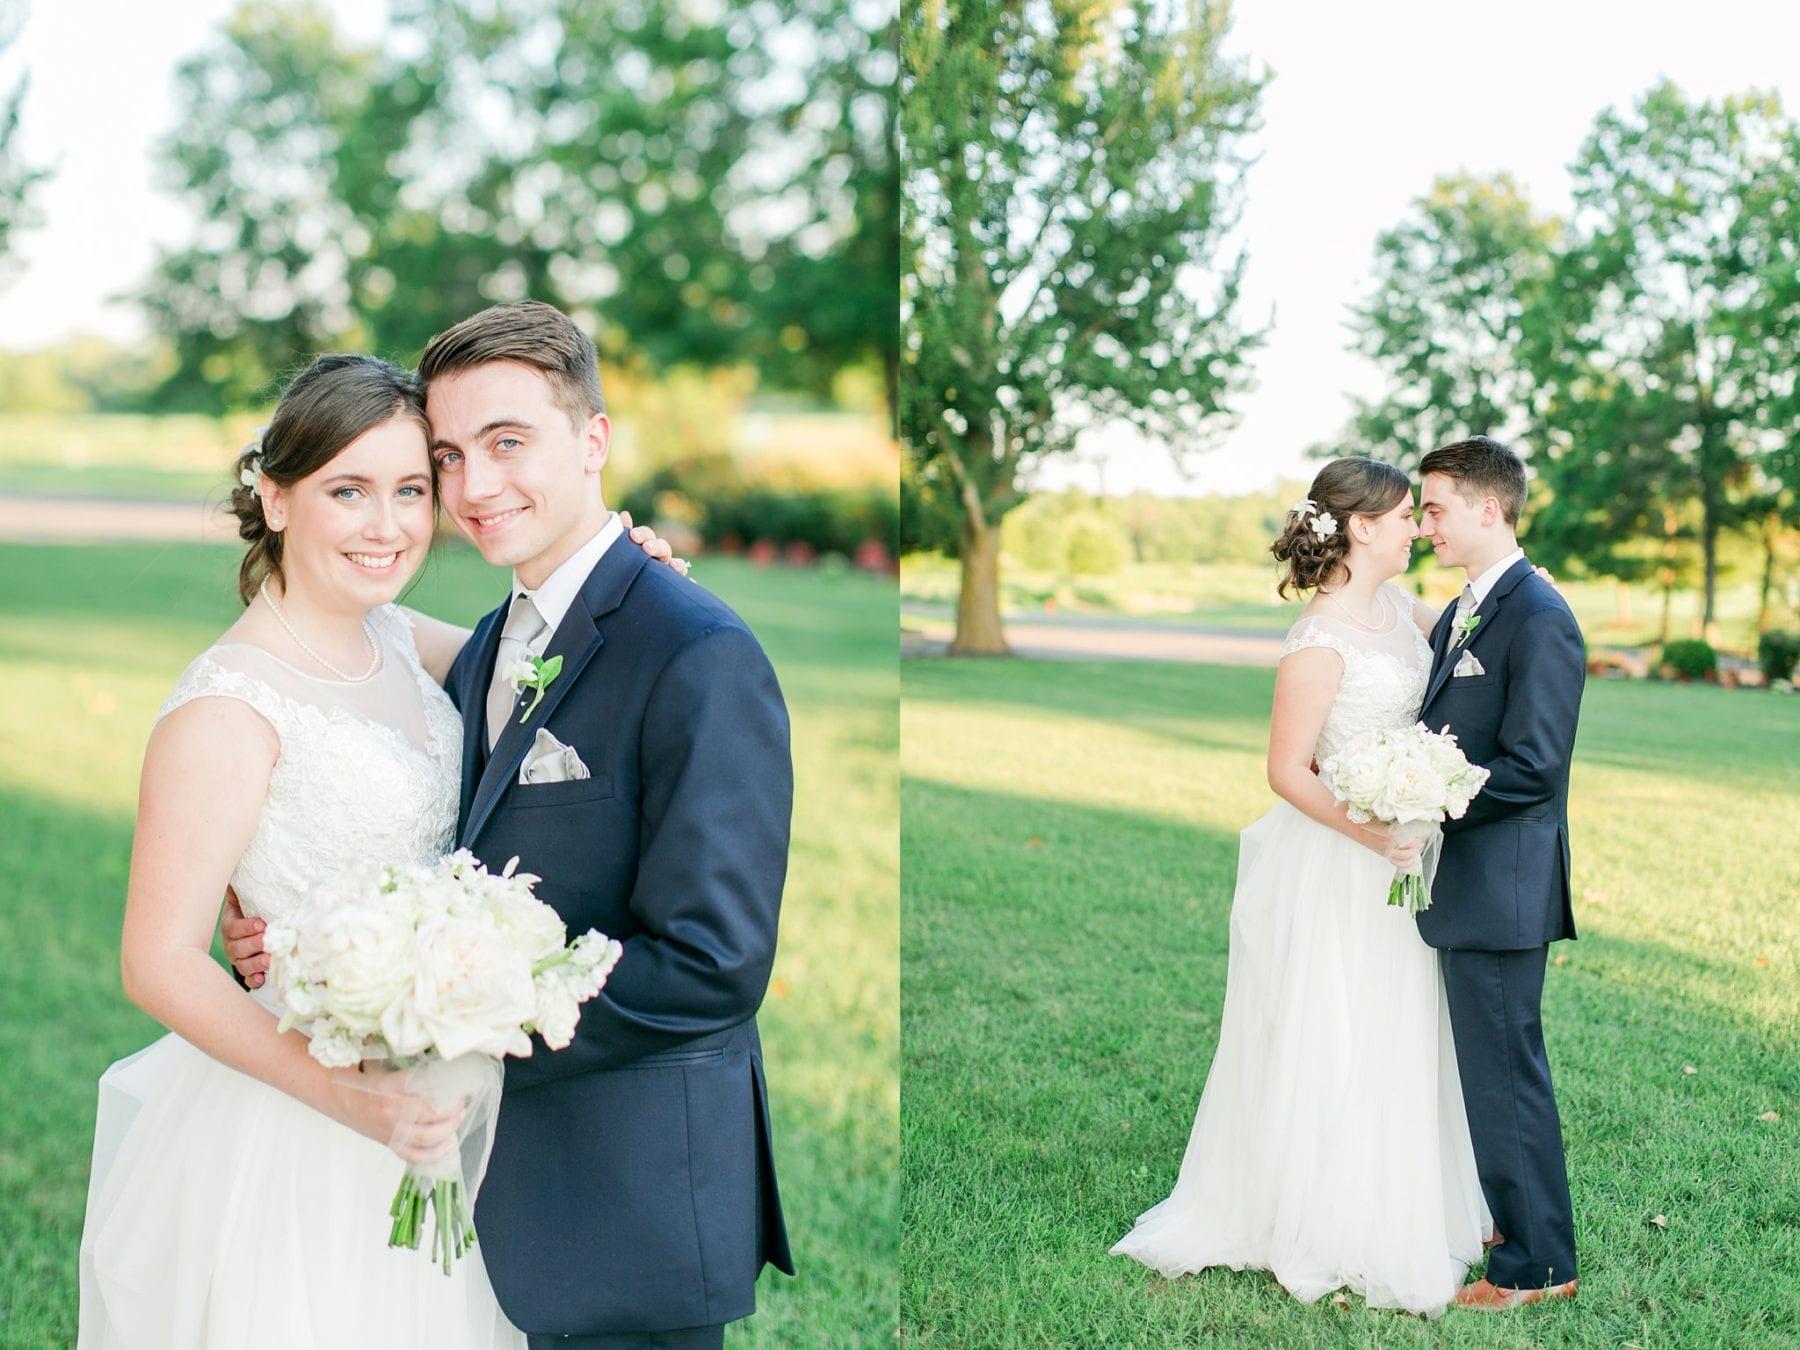 Bristow Manor Wedding Photos Virginia Wedding Photographer Lauren & Andrew Megan Kelsey Photography-523.jpg